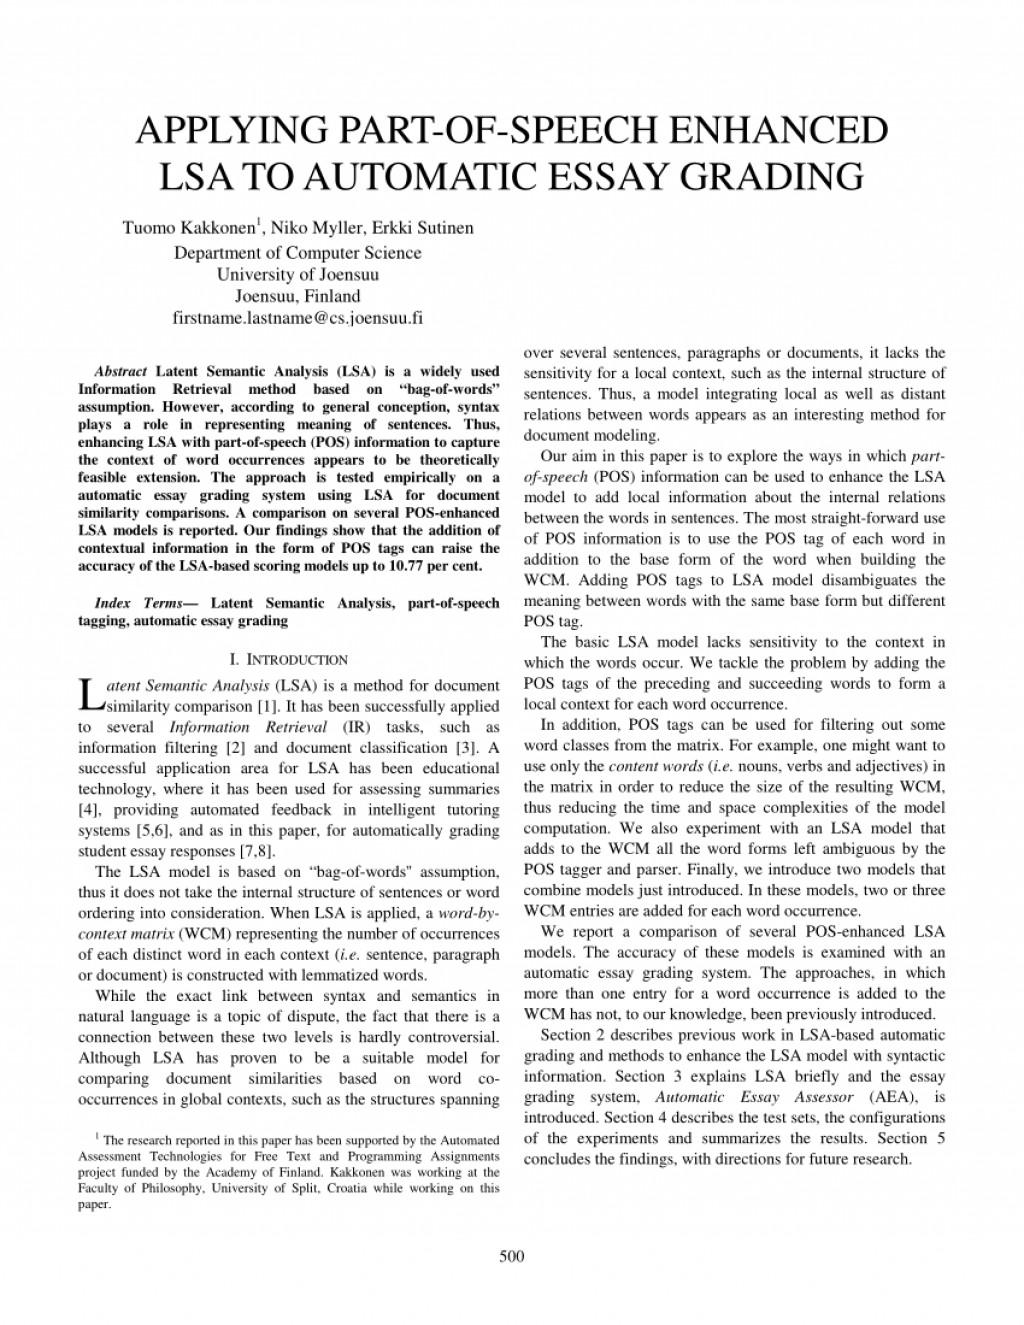 007 Automatic Essay Grader Free Example Singular Large